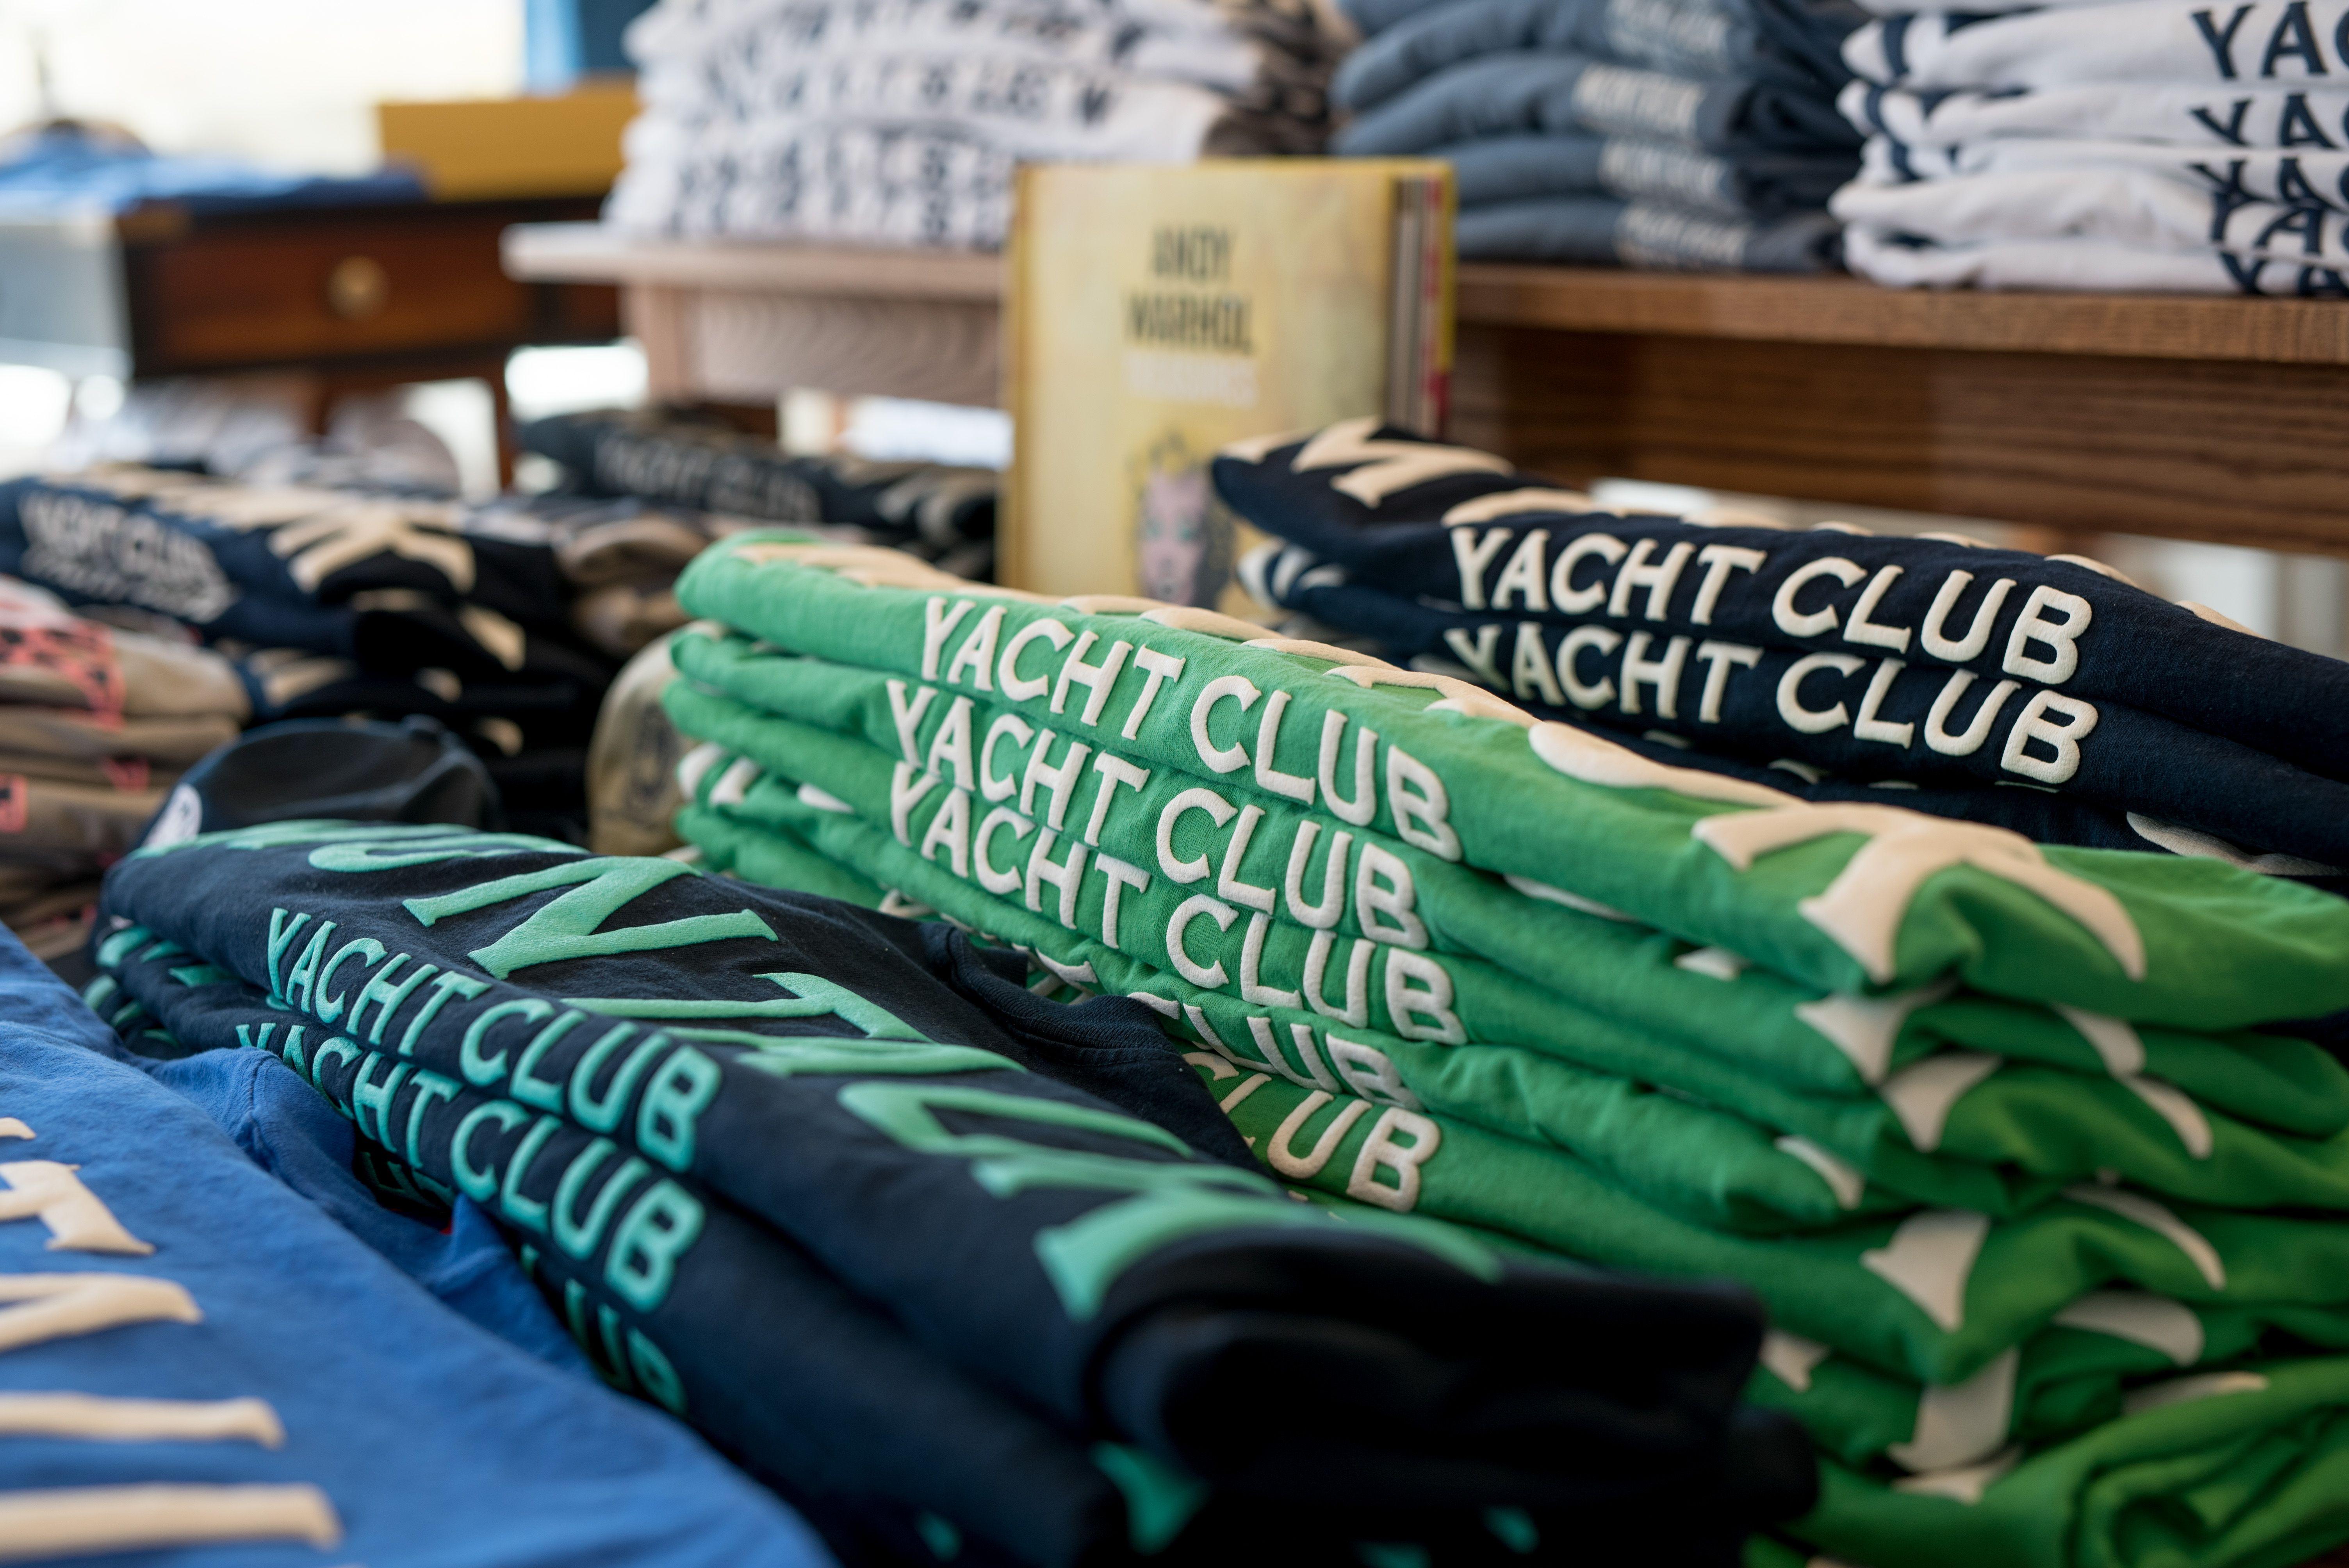 #MYC #Montauk #MontaukYachtClub #GiftShop #Shirts #YachtClub #Marina #Resort